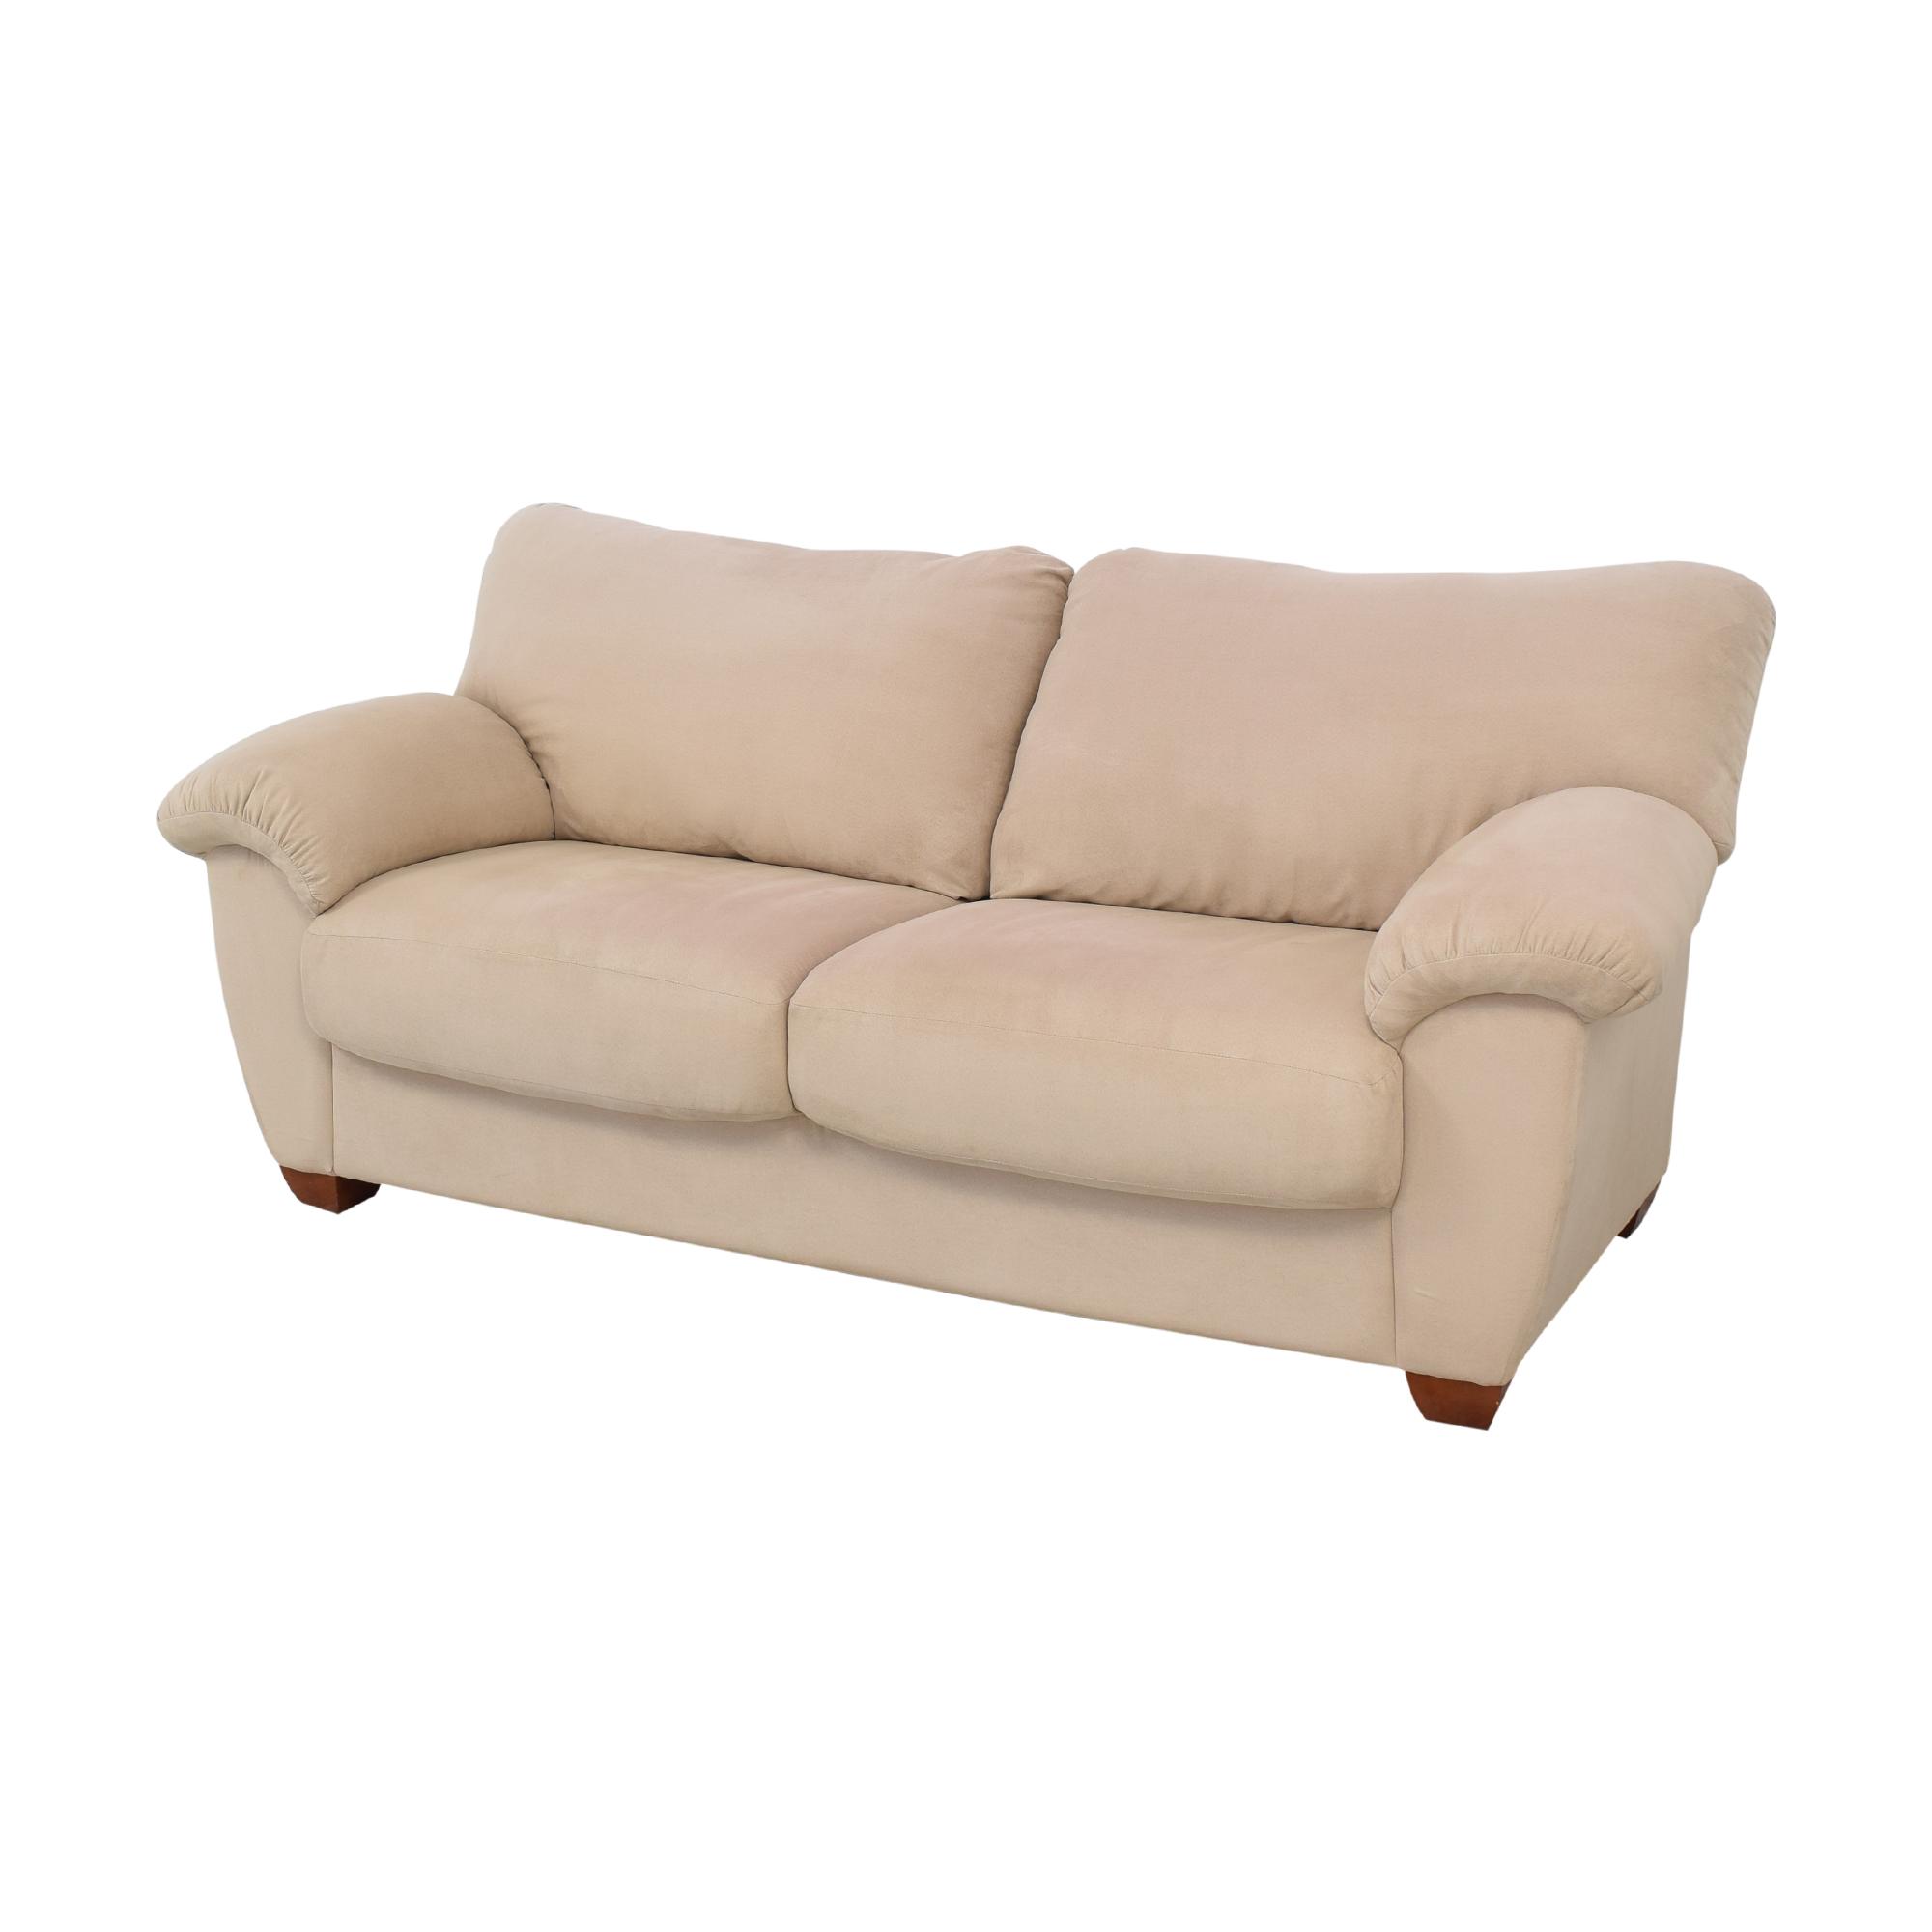 Two Cushion Sofa ct